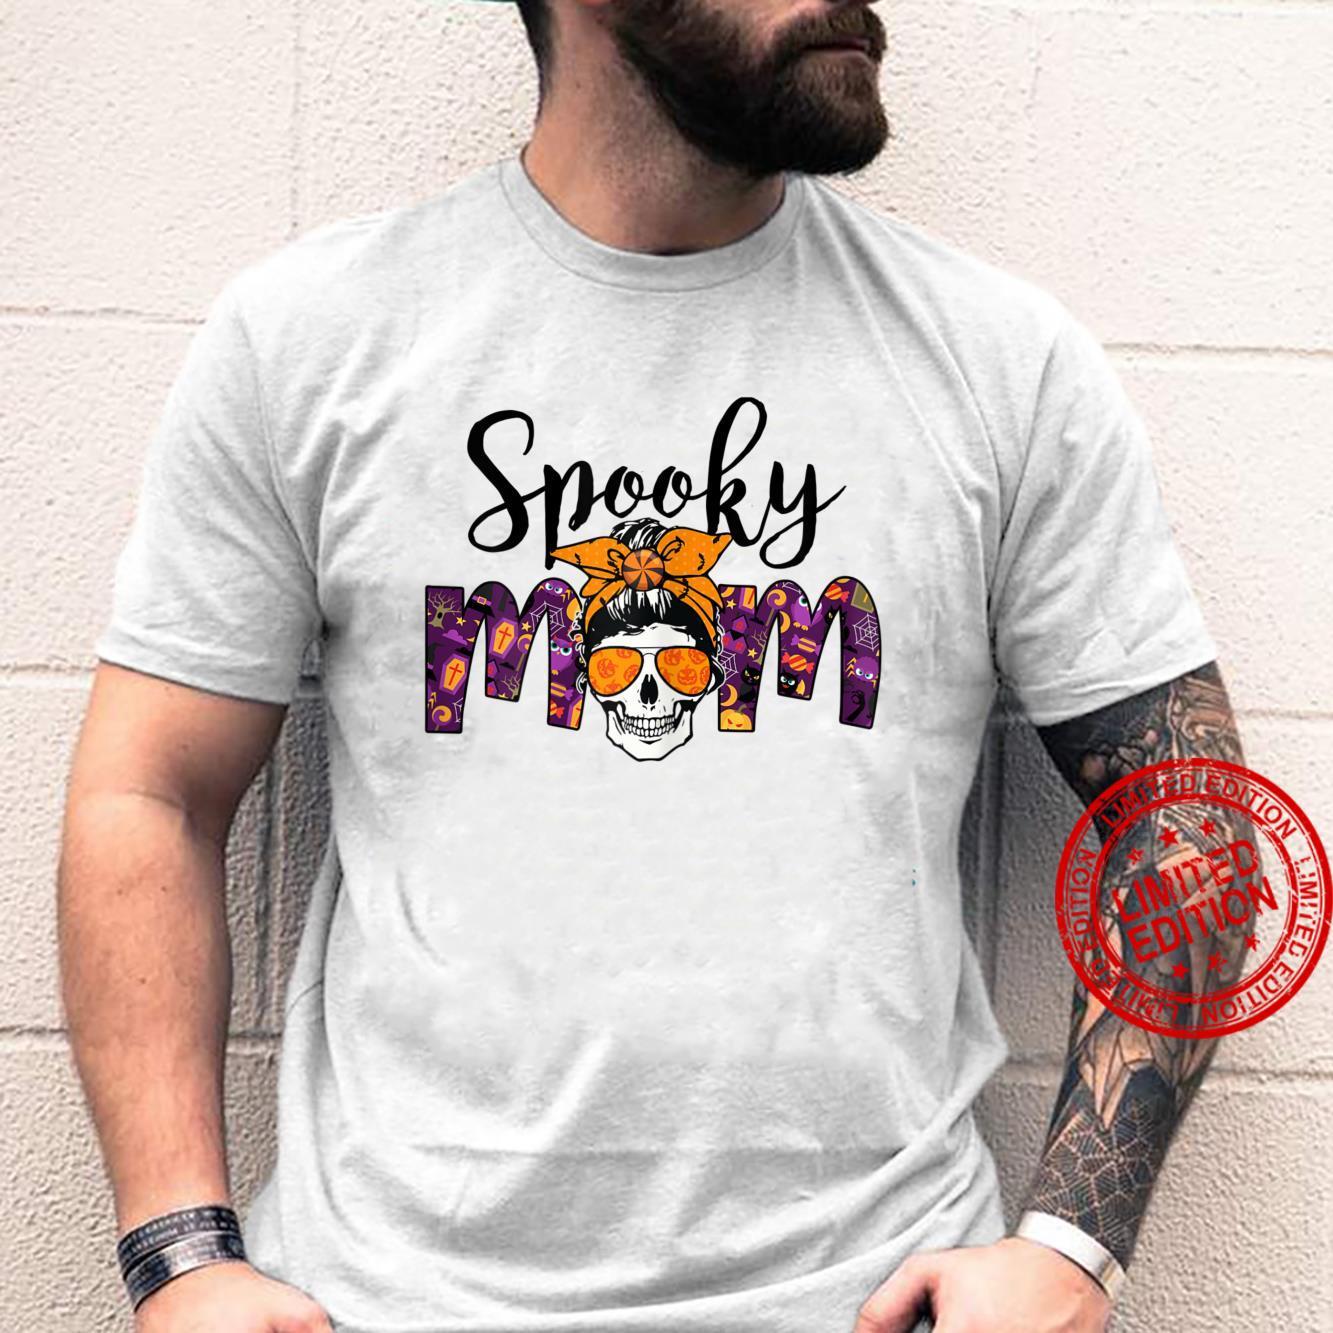 Womens BRB3 Messy Bun Spooky Mom Happy Autumn Halloween Spooky Shirt